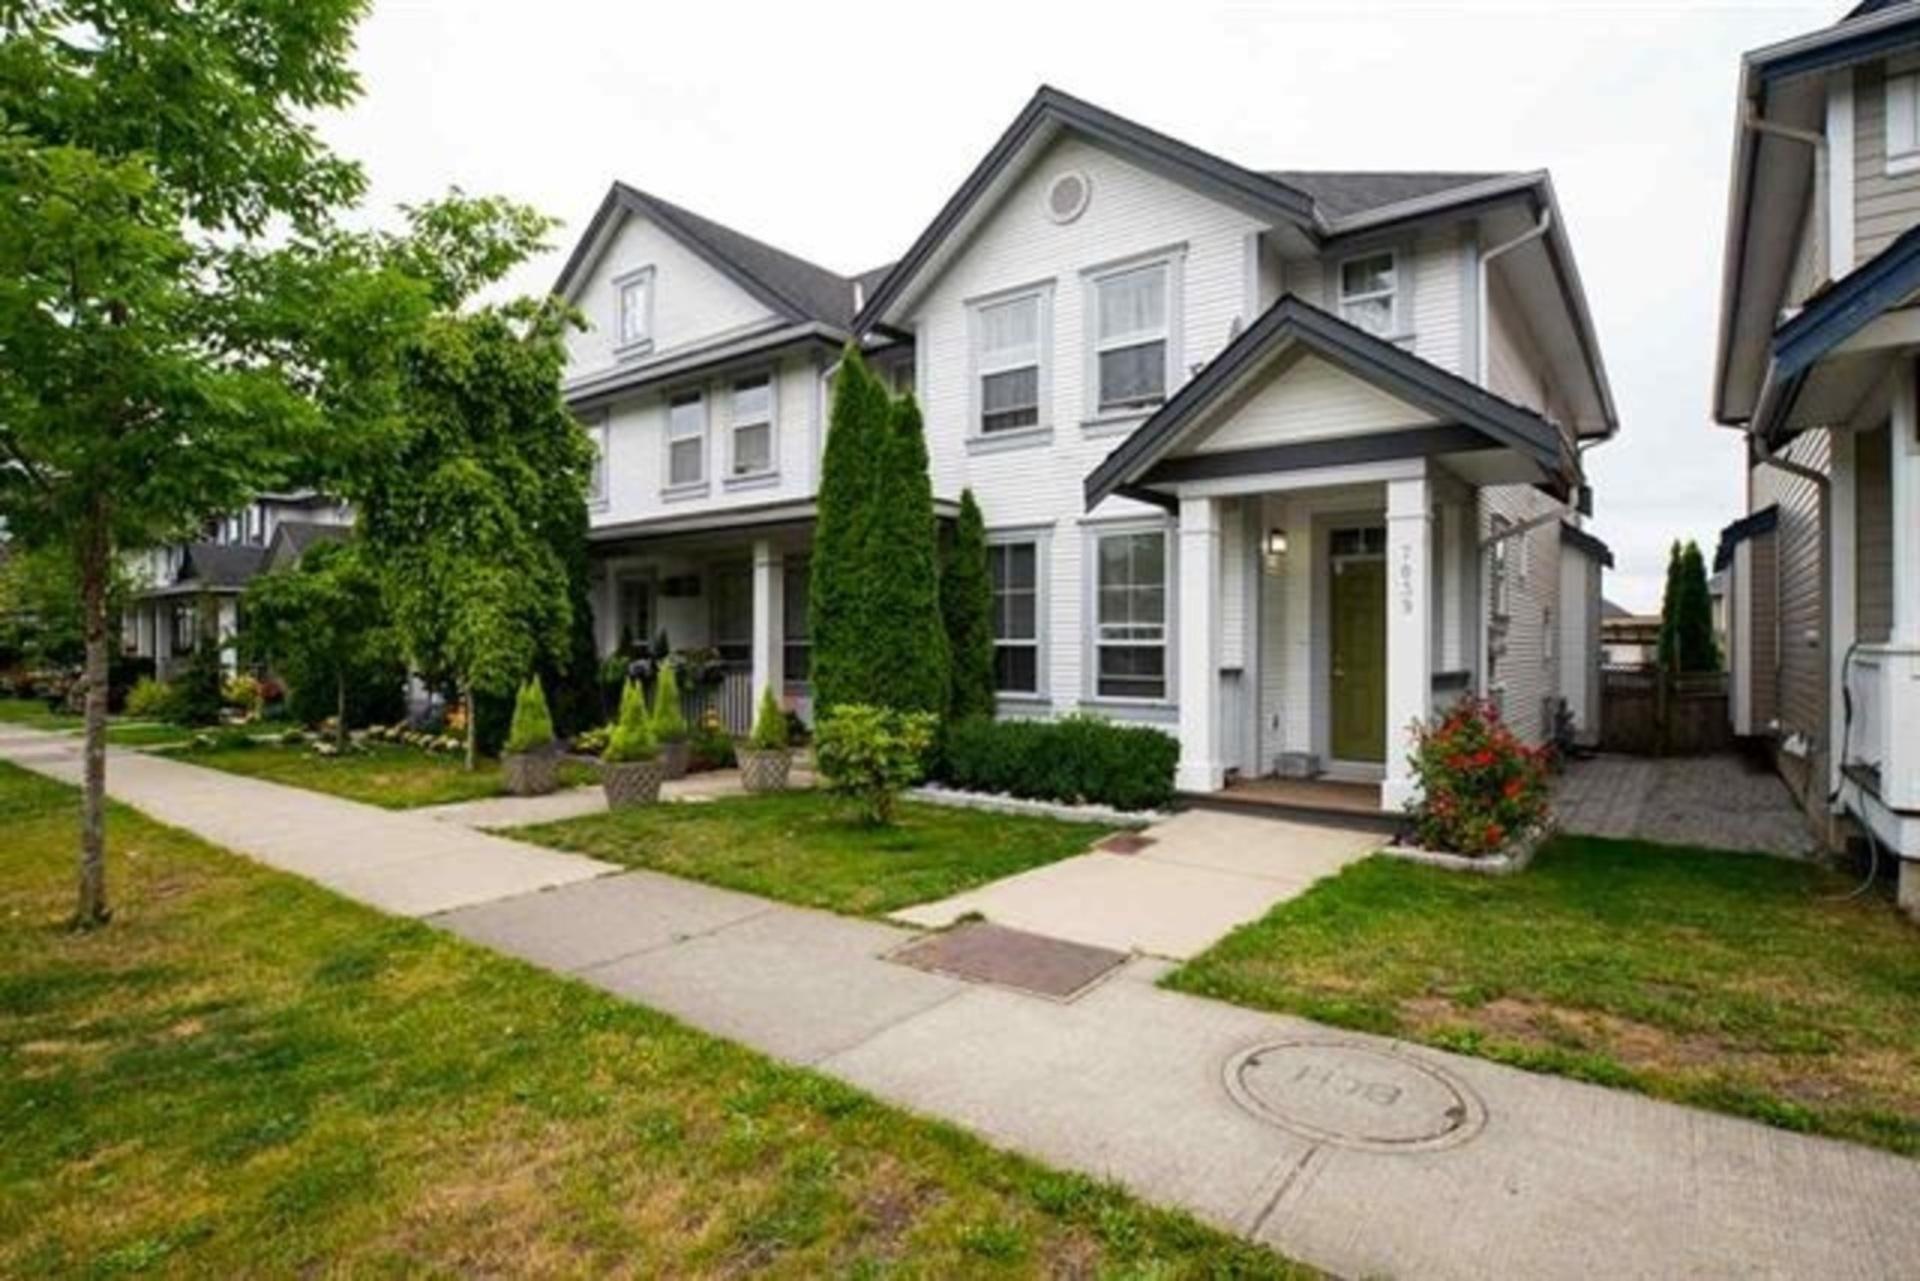 7039-180-street-cloverdale-bc-cloverdale-01 at 7039 180 Street, Cloverdale BC, Cloverdale